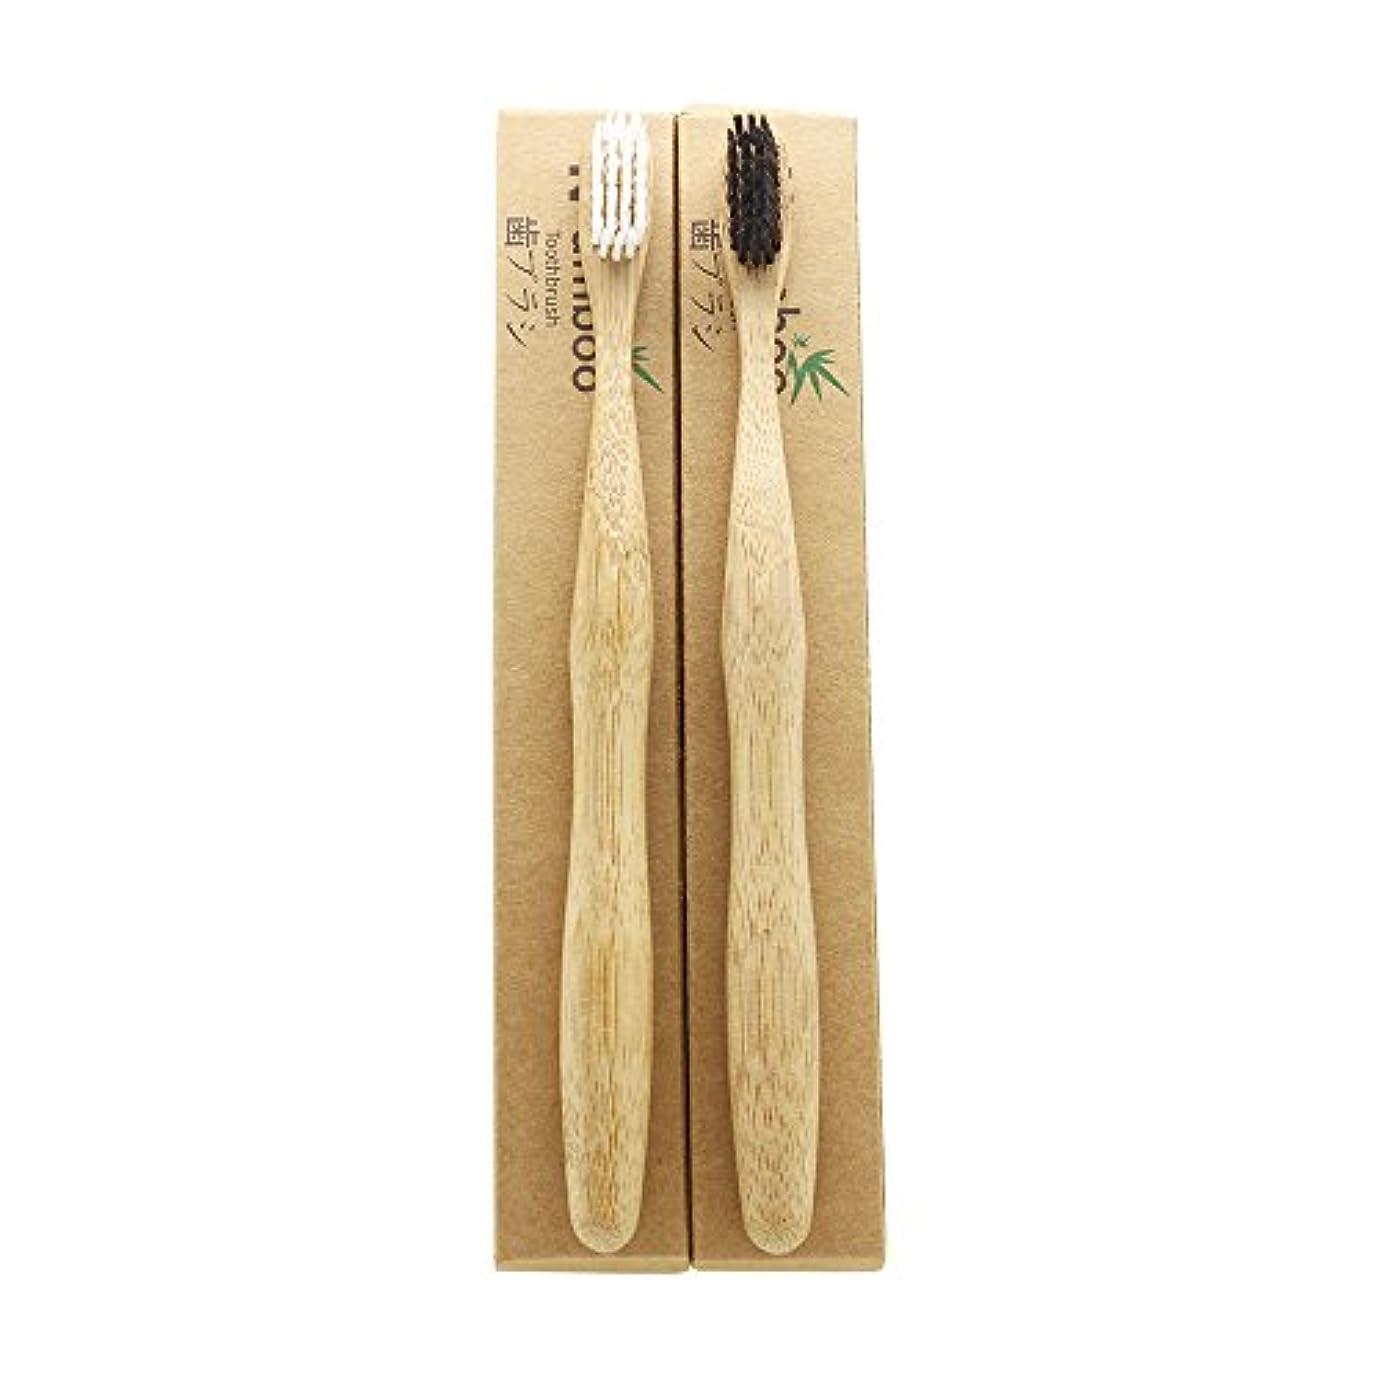 N-amboo 竹製 歯ブラシ 高耐久性 白と黒 セット エコ (2本)